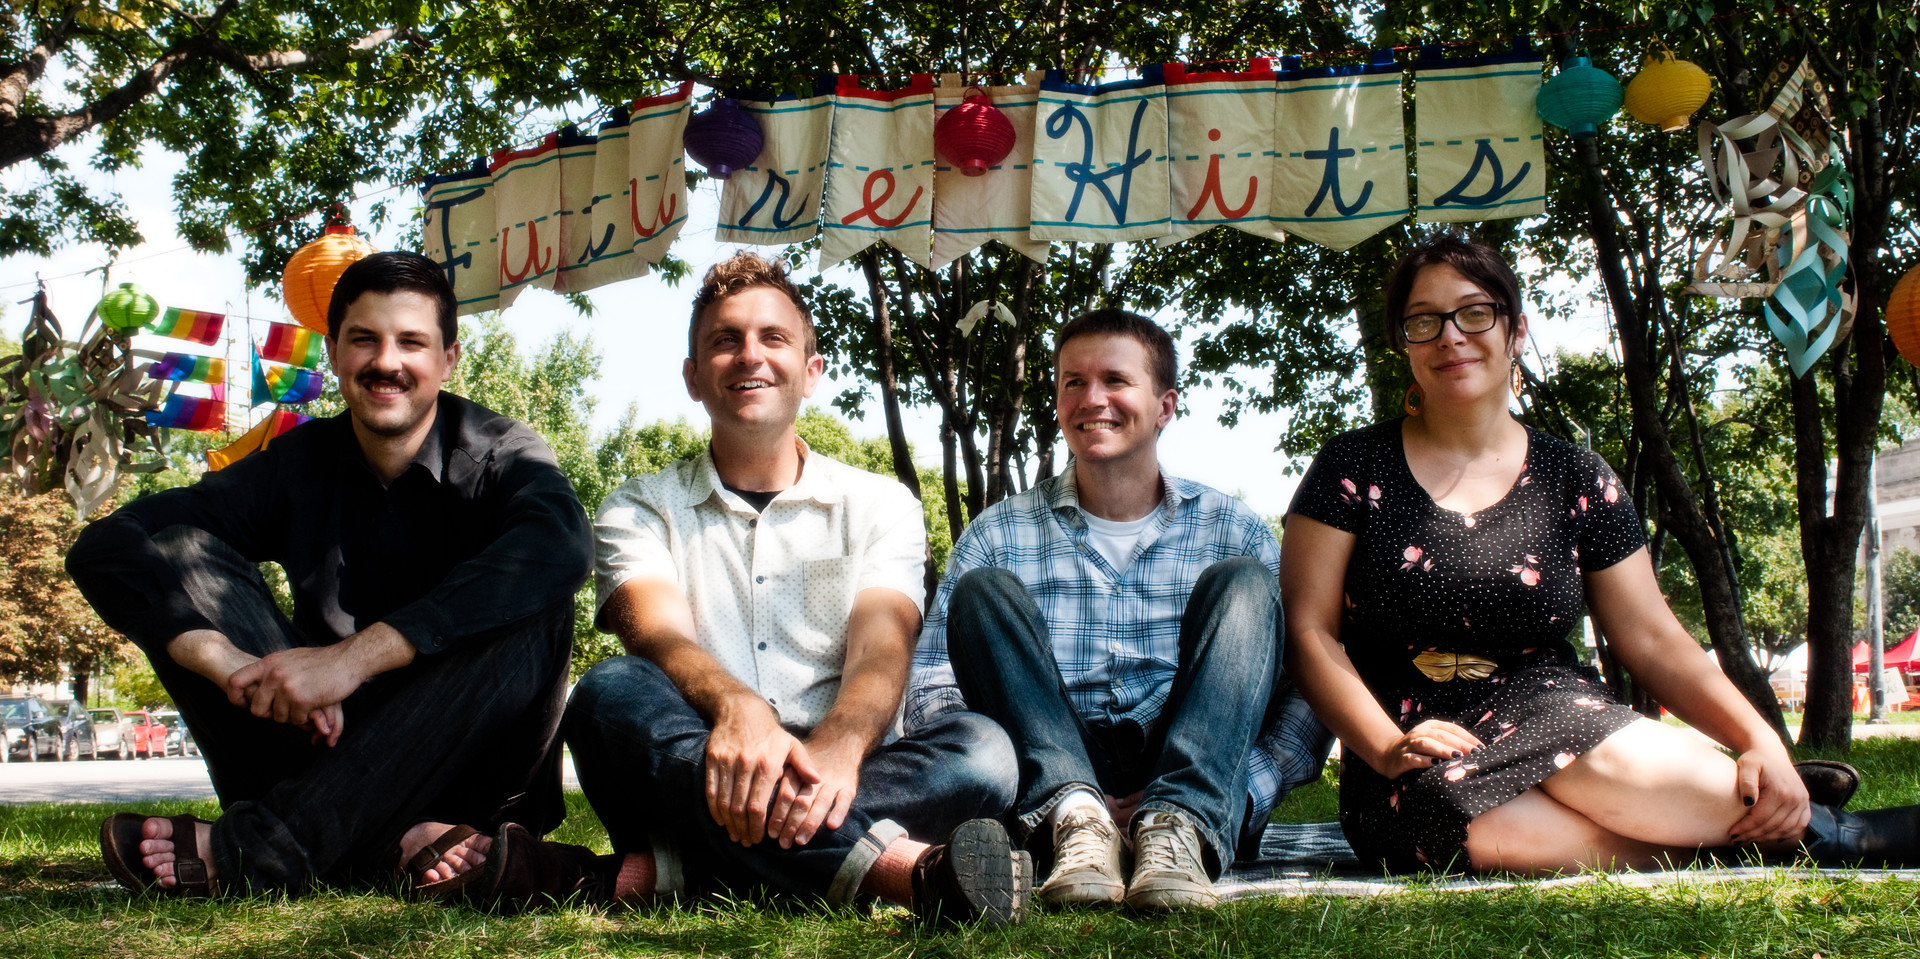 From left: Nick, Matt, Ben, Emma